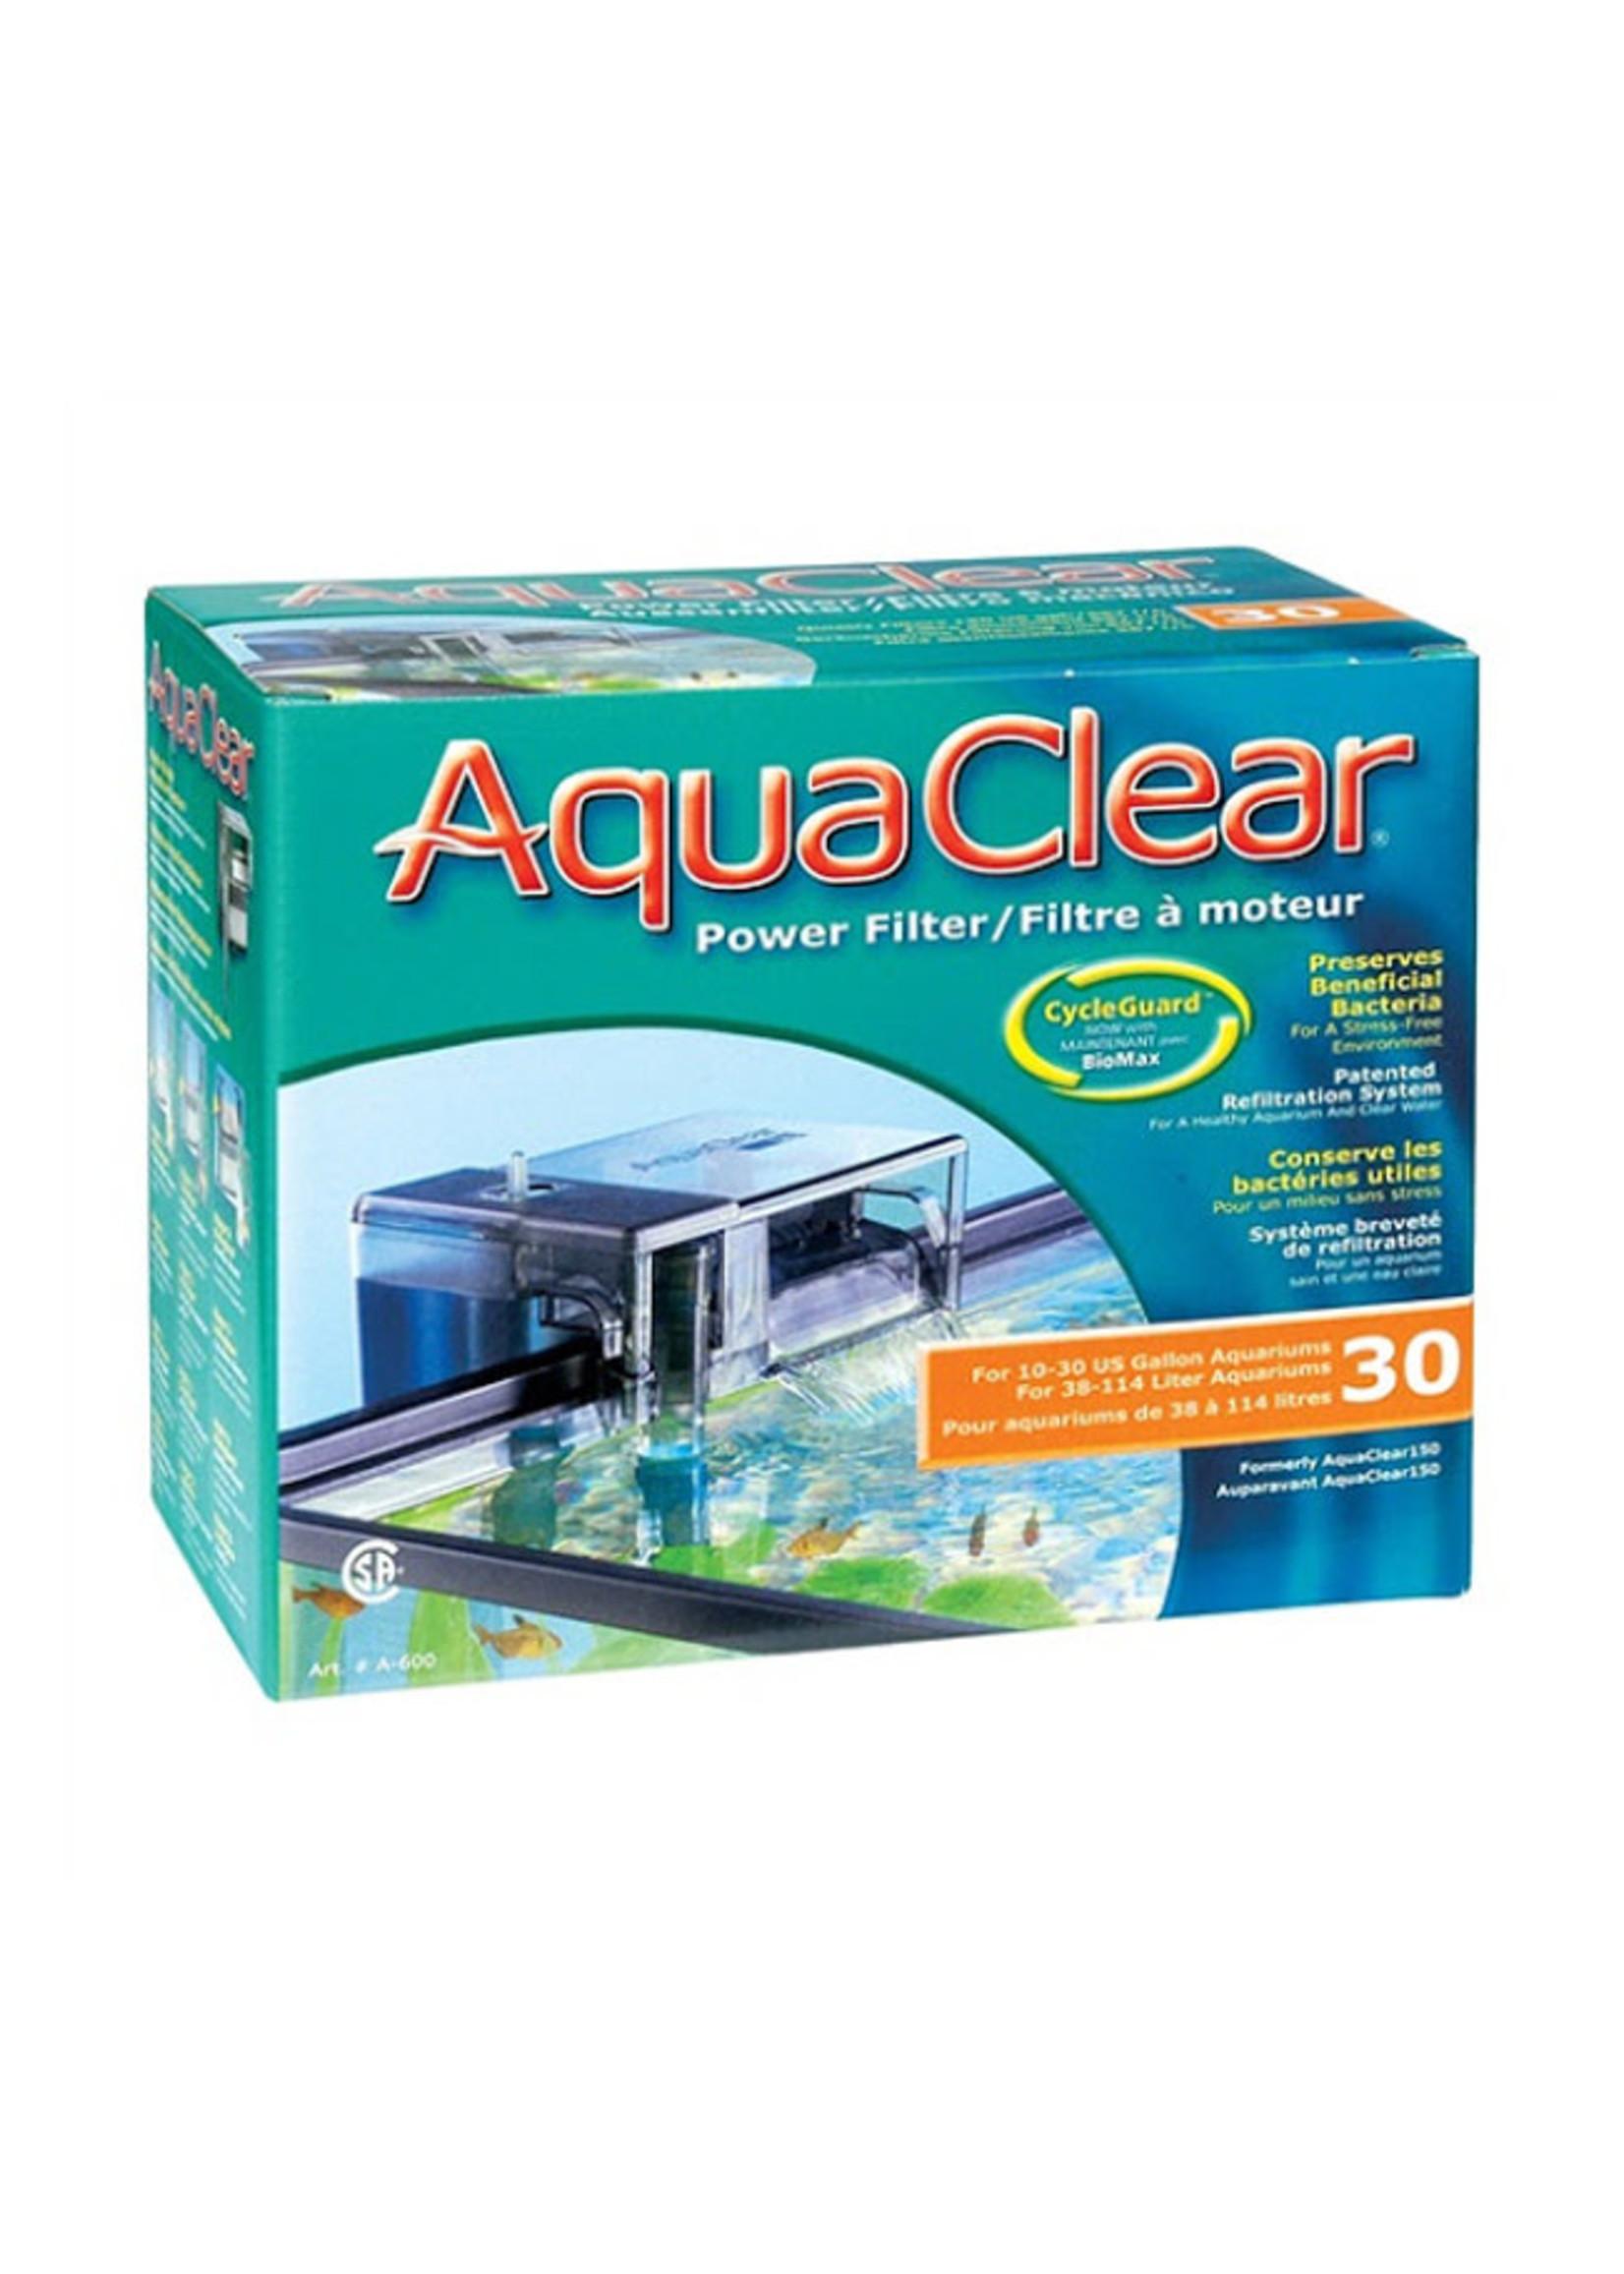 AquaClear AquaClear Power Filter 30